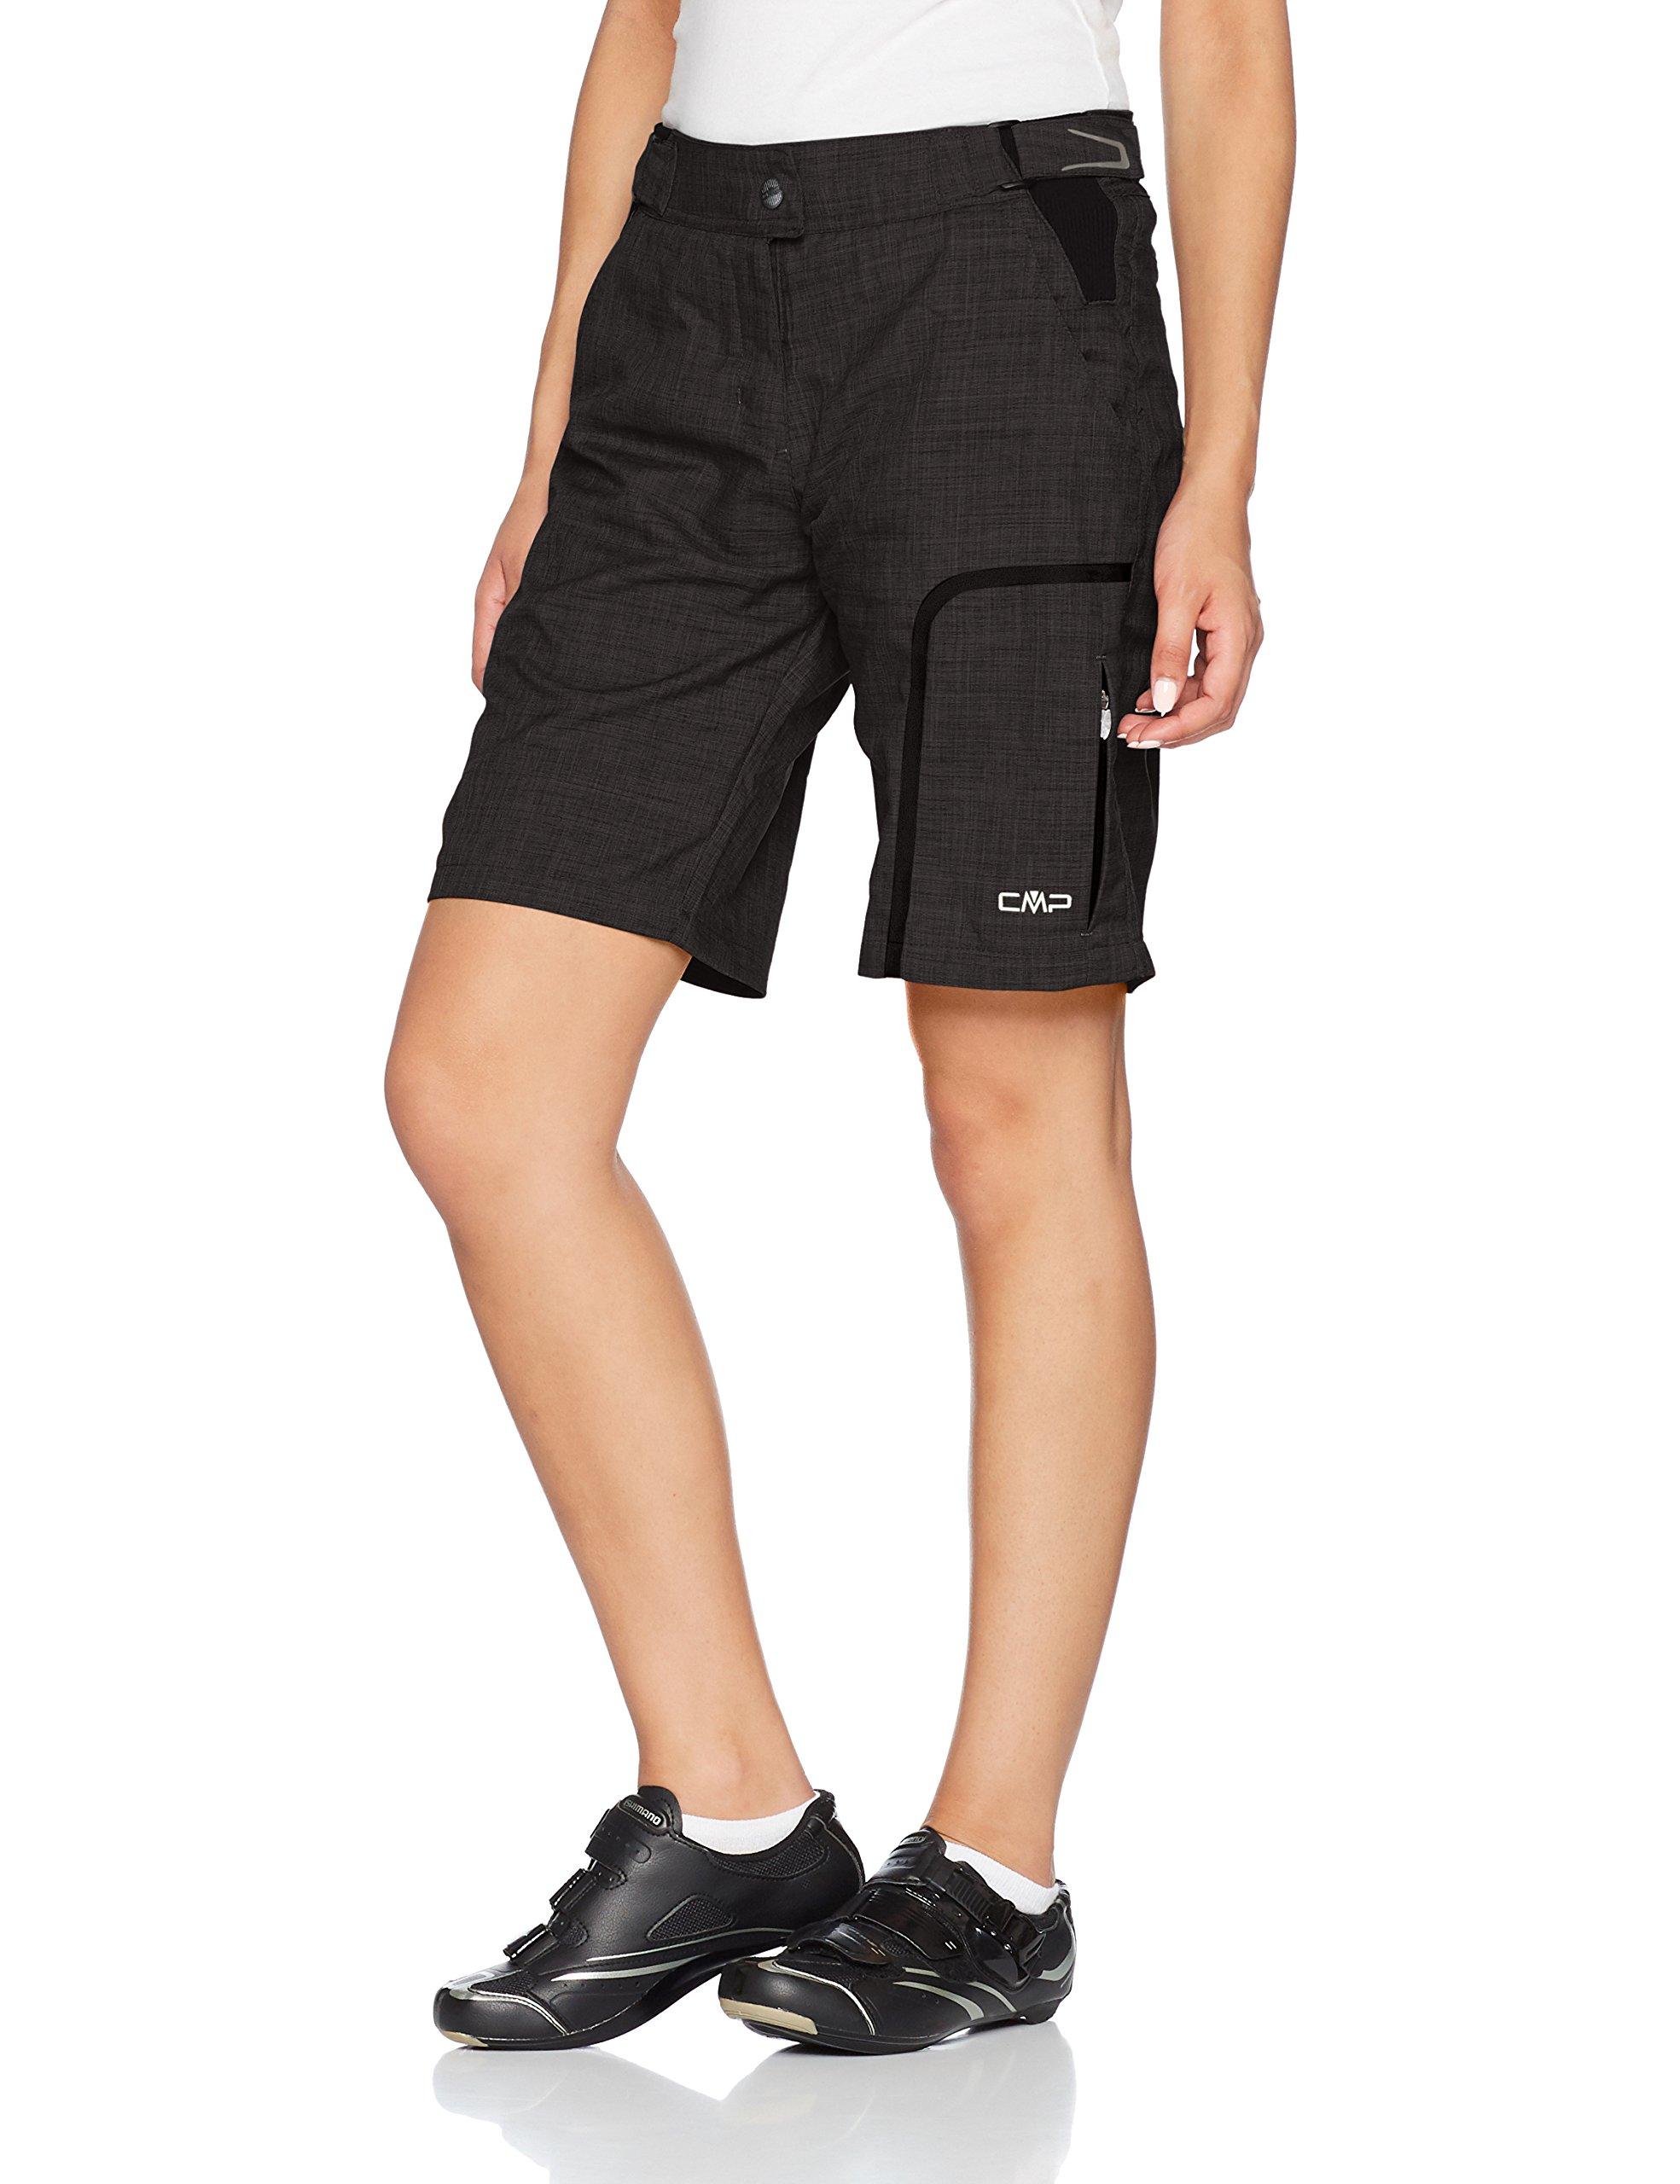 CMP Damen 3c96476 Rad Mountain Bike Shorts